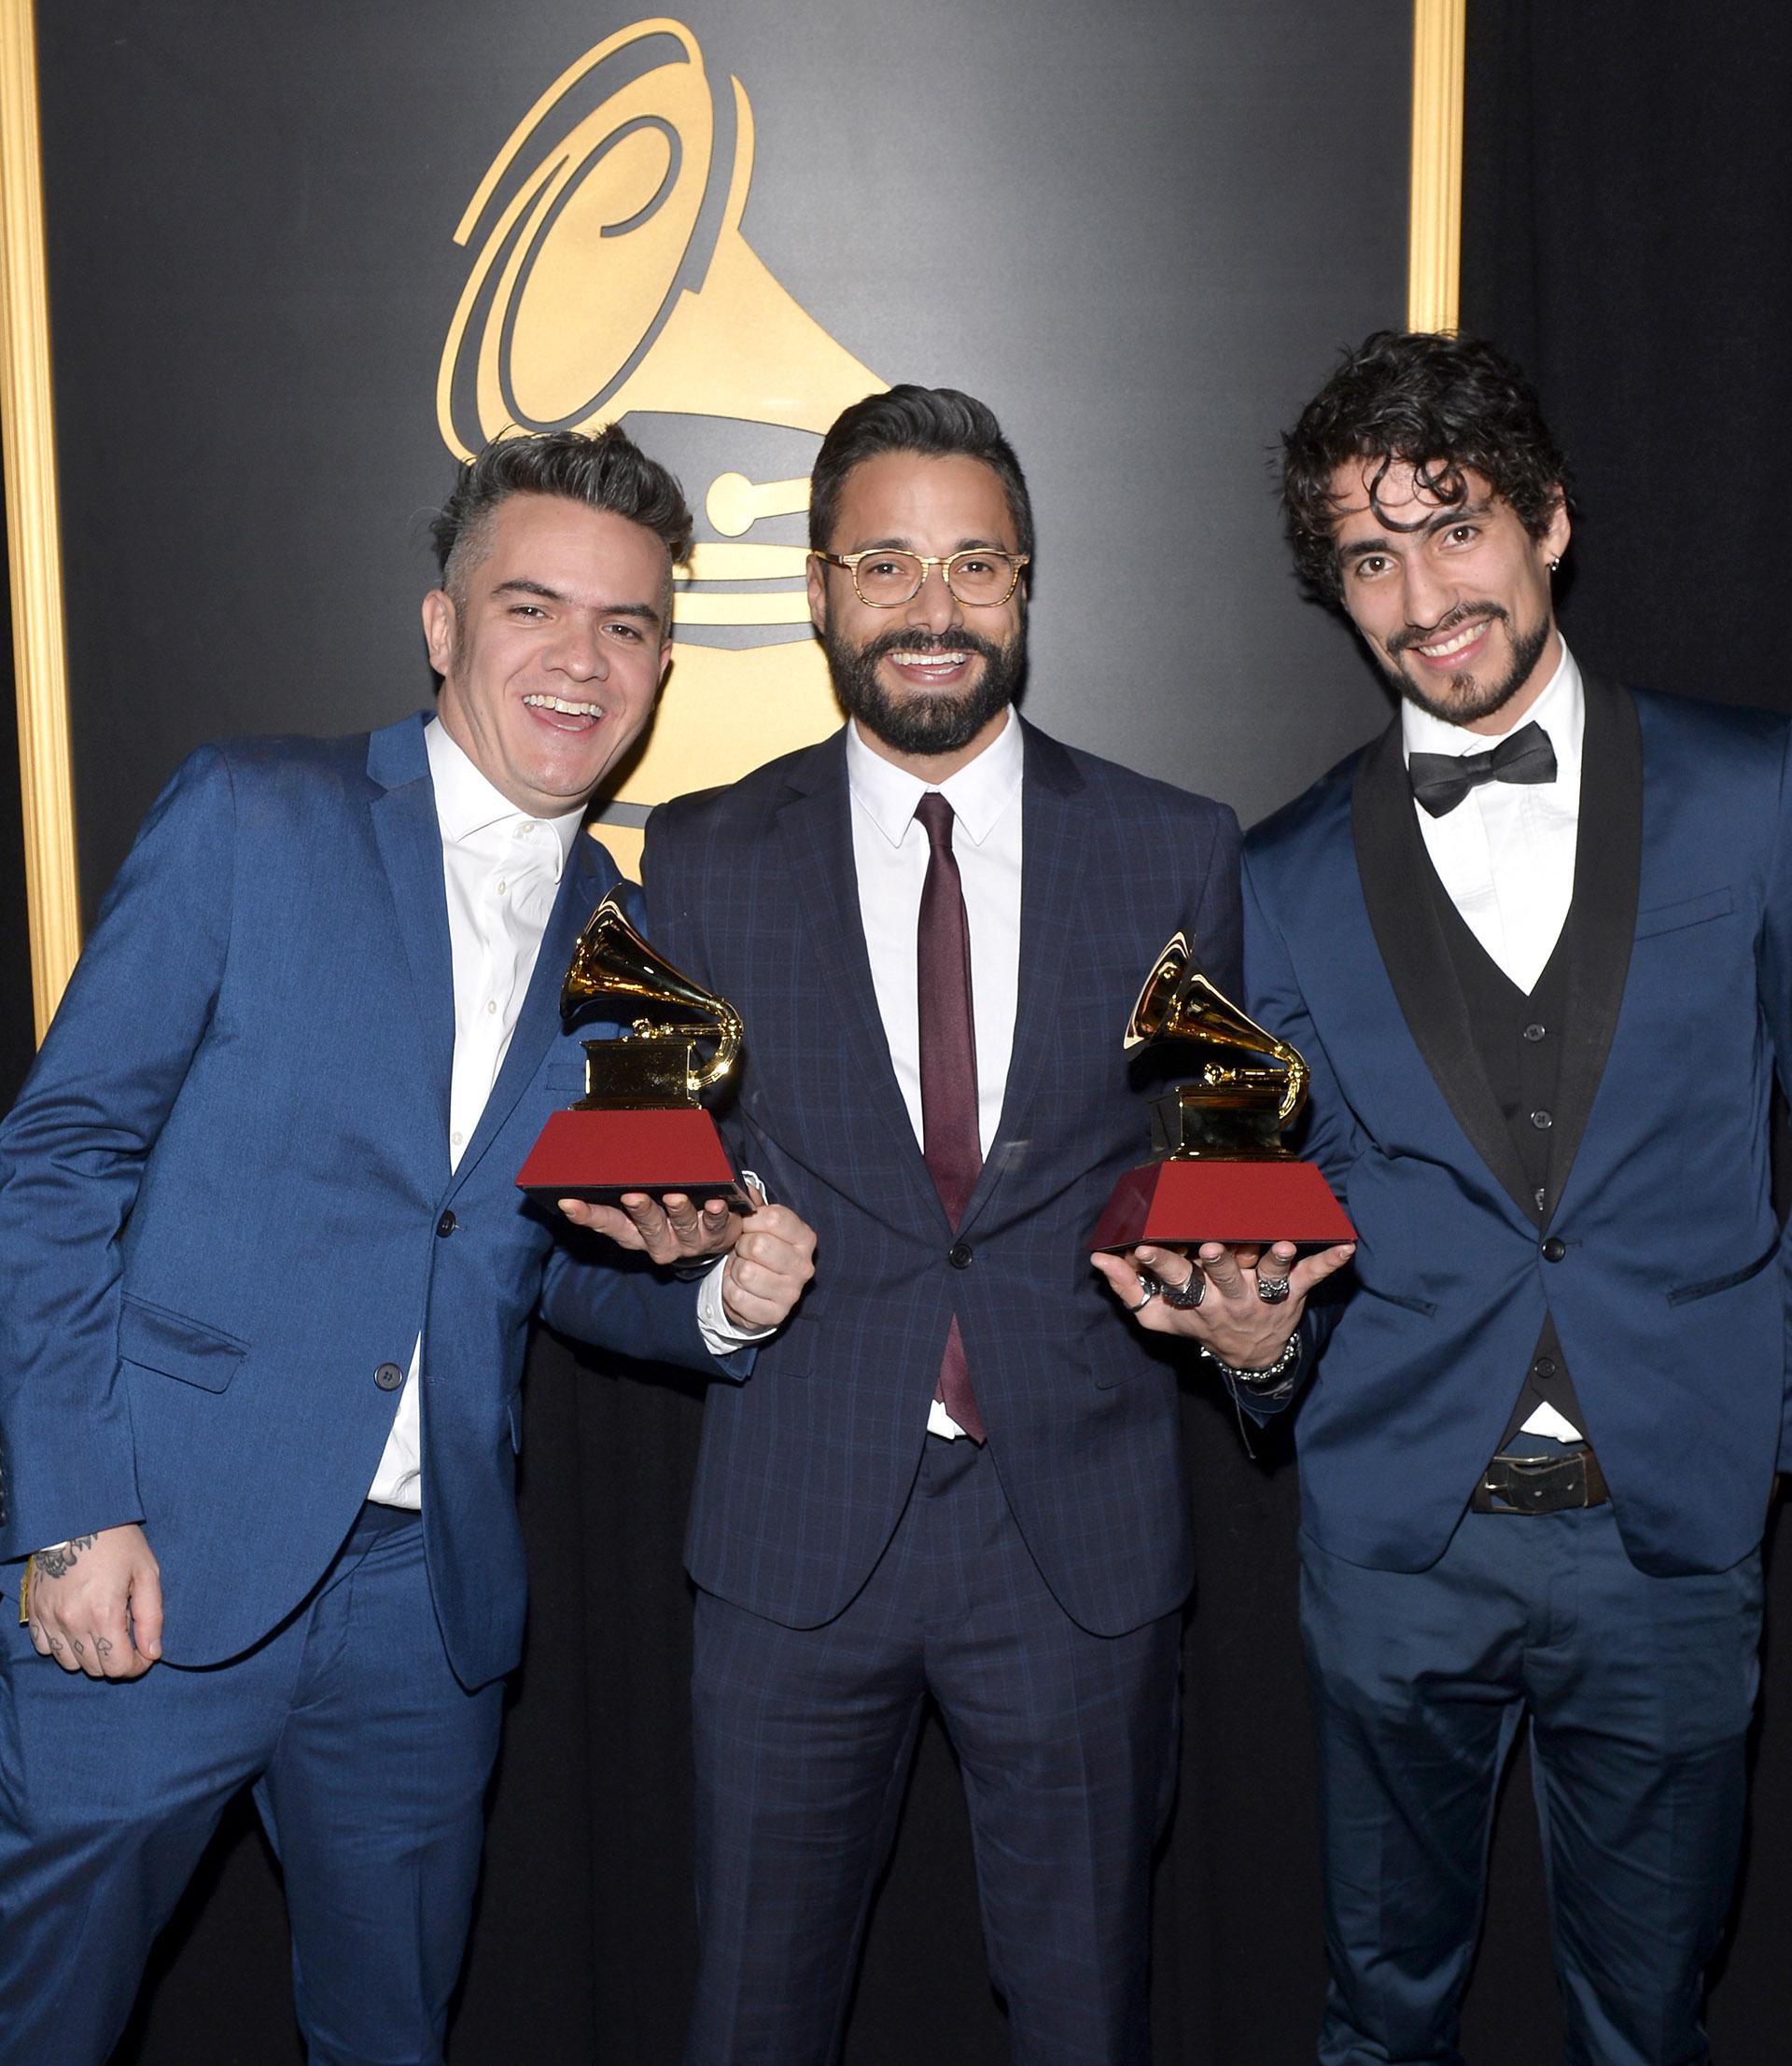 Juan Galeano, Daniel Álvarez y Andee Zeta del grupo Diamante Eléctrico (Bryan Steffy/Getty Images for LARAS)